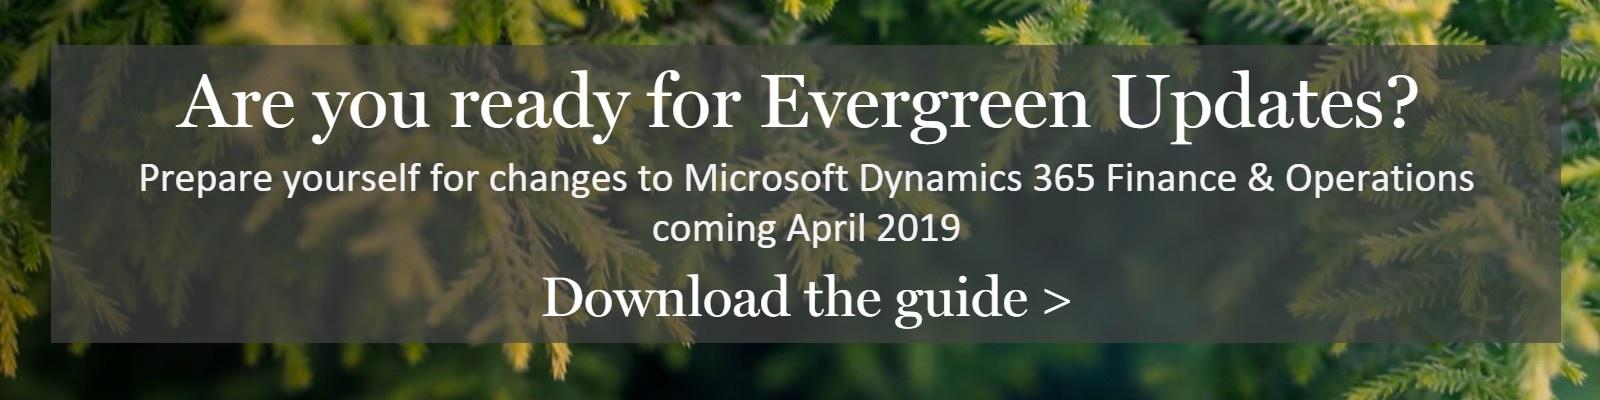 evergreen updates for microsoft dynamics